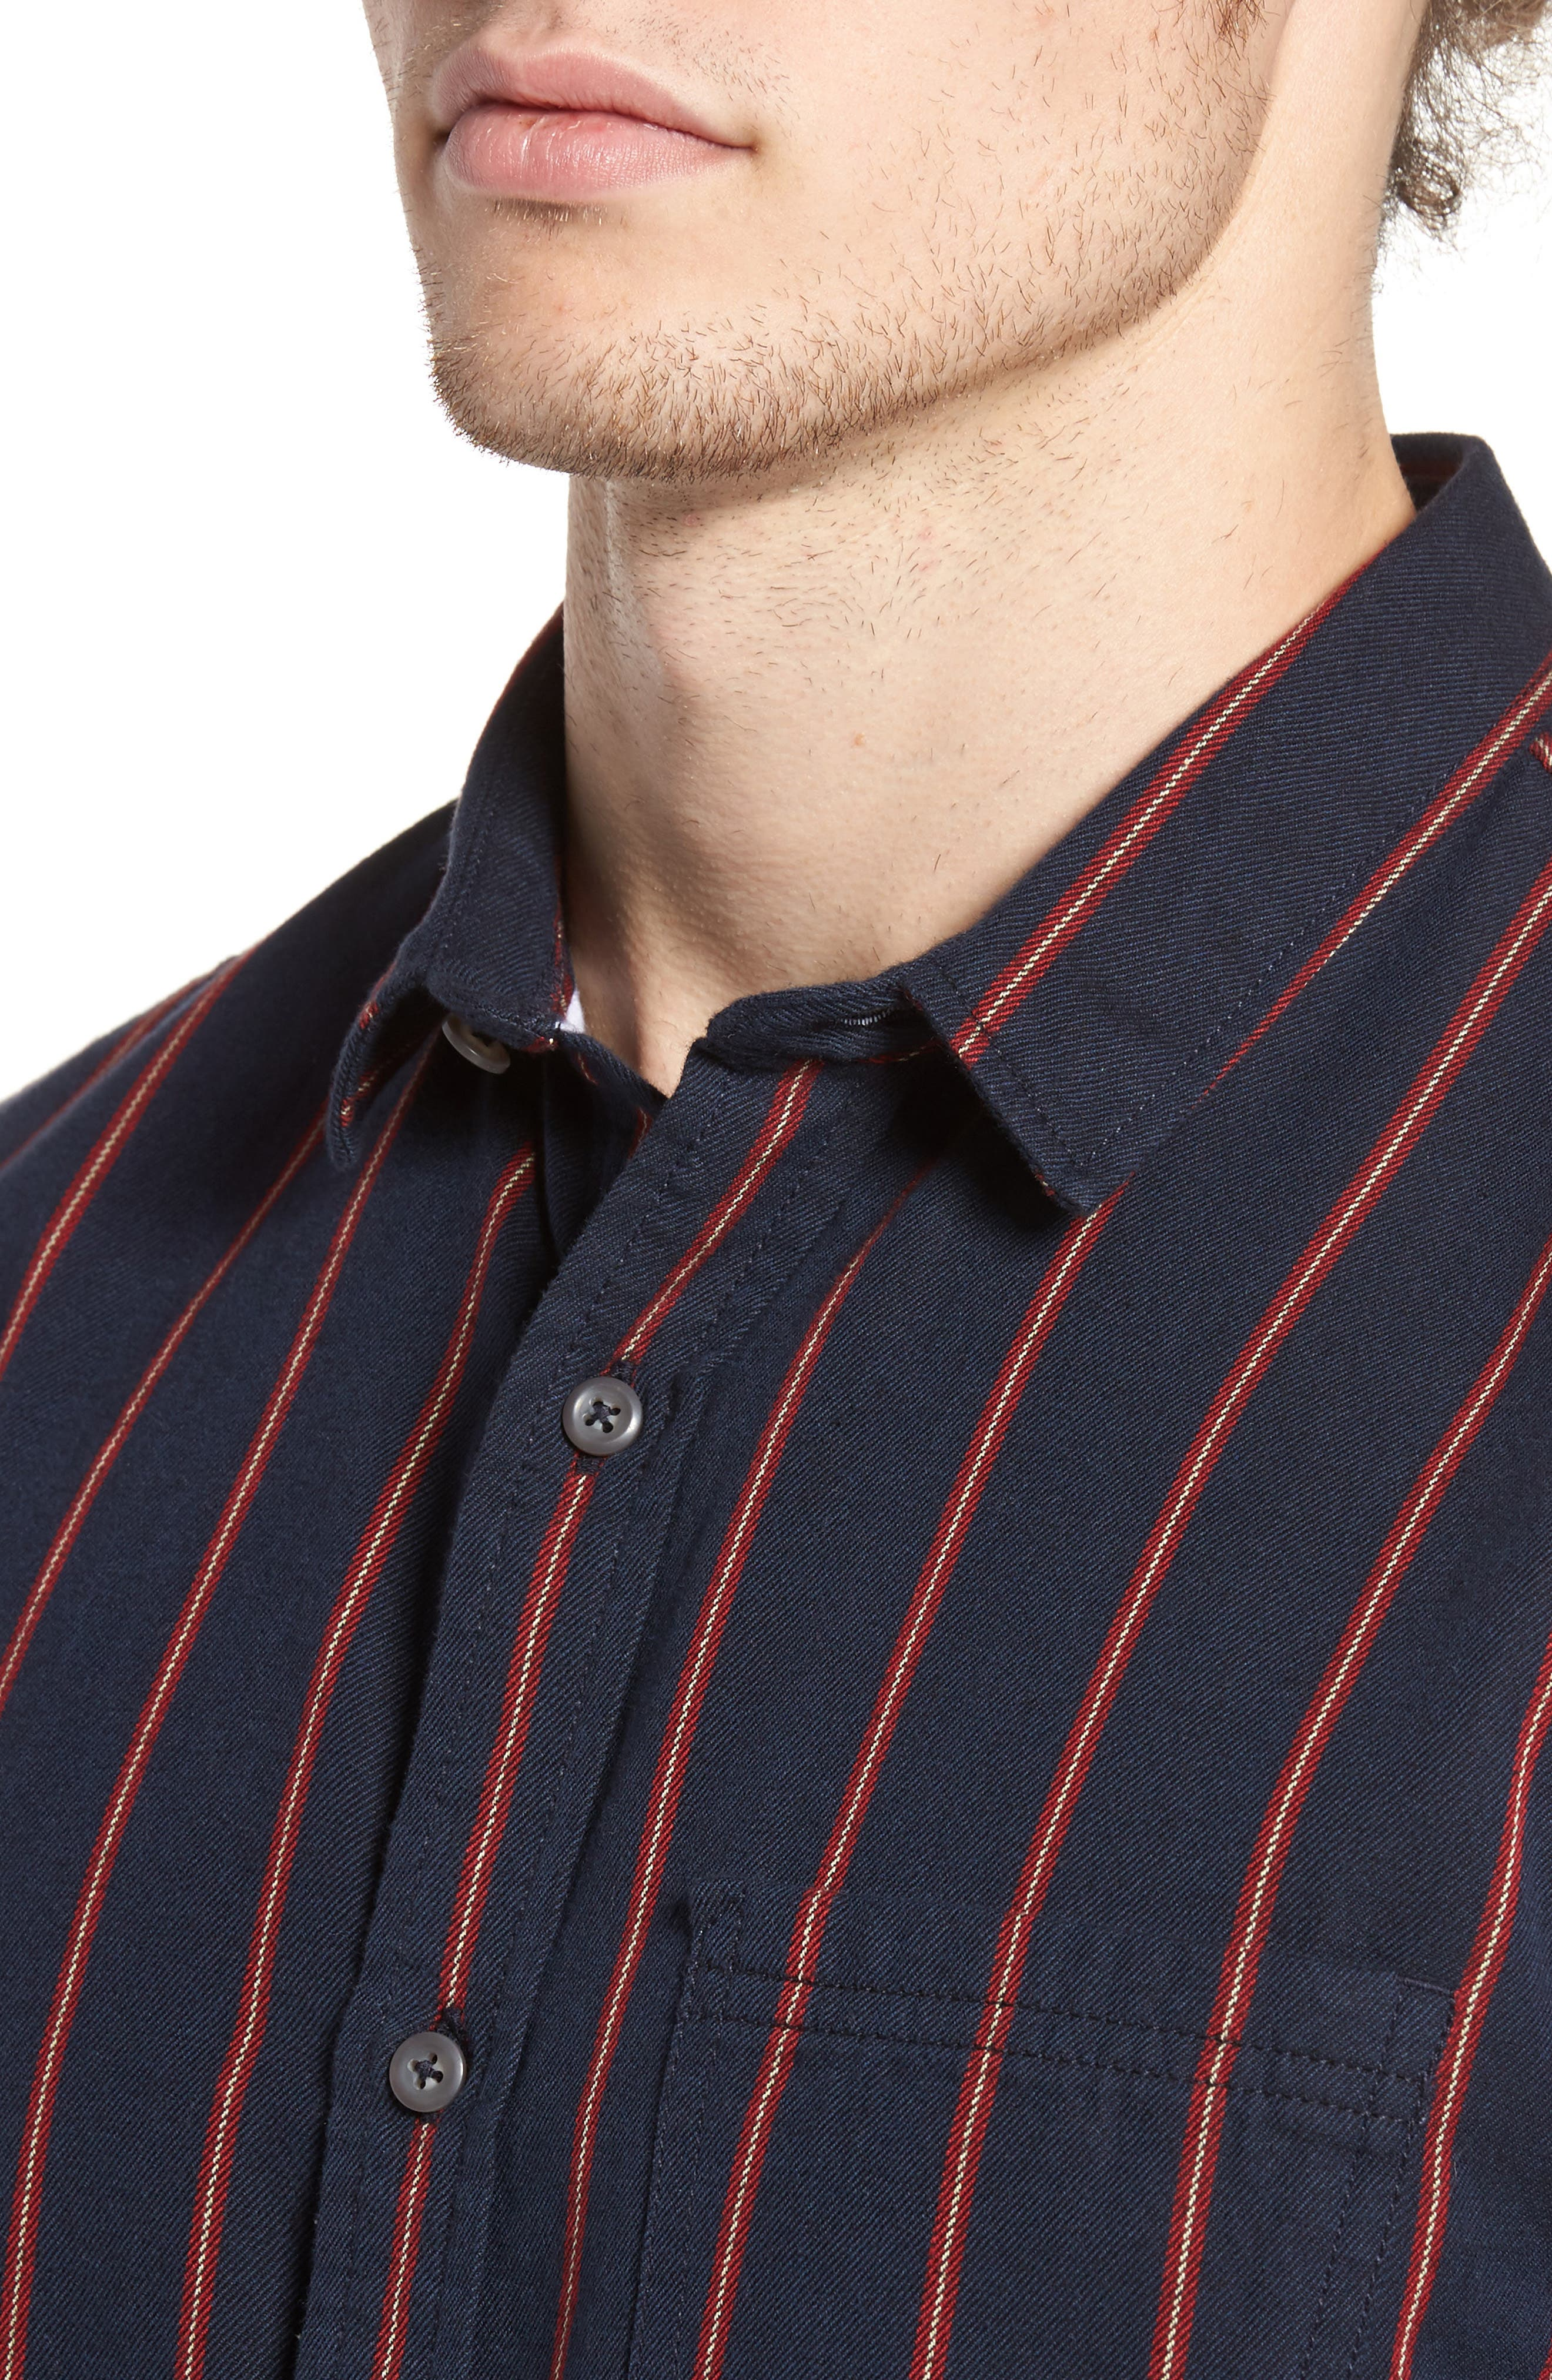 The Rail Long Sleeve Twill Shirt,                             Alternate thumbnail 4, color,                             Navy Peacoat Red Stripe